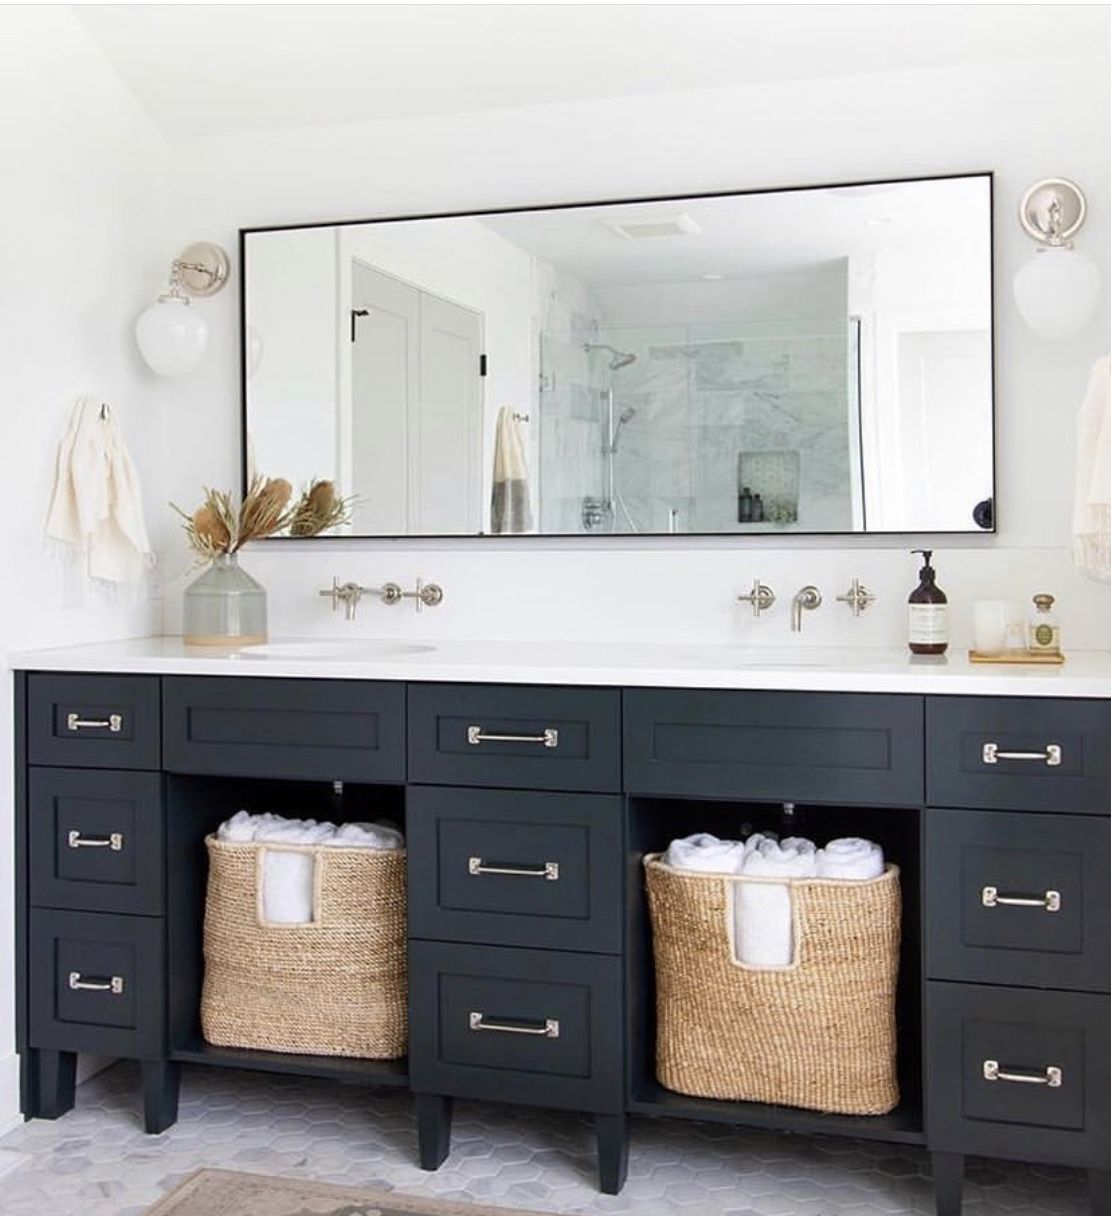 Mirror In 2020 Bathroom Vanity Designs Double Vanity Bathroom Bathroom Interior Design